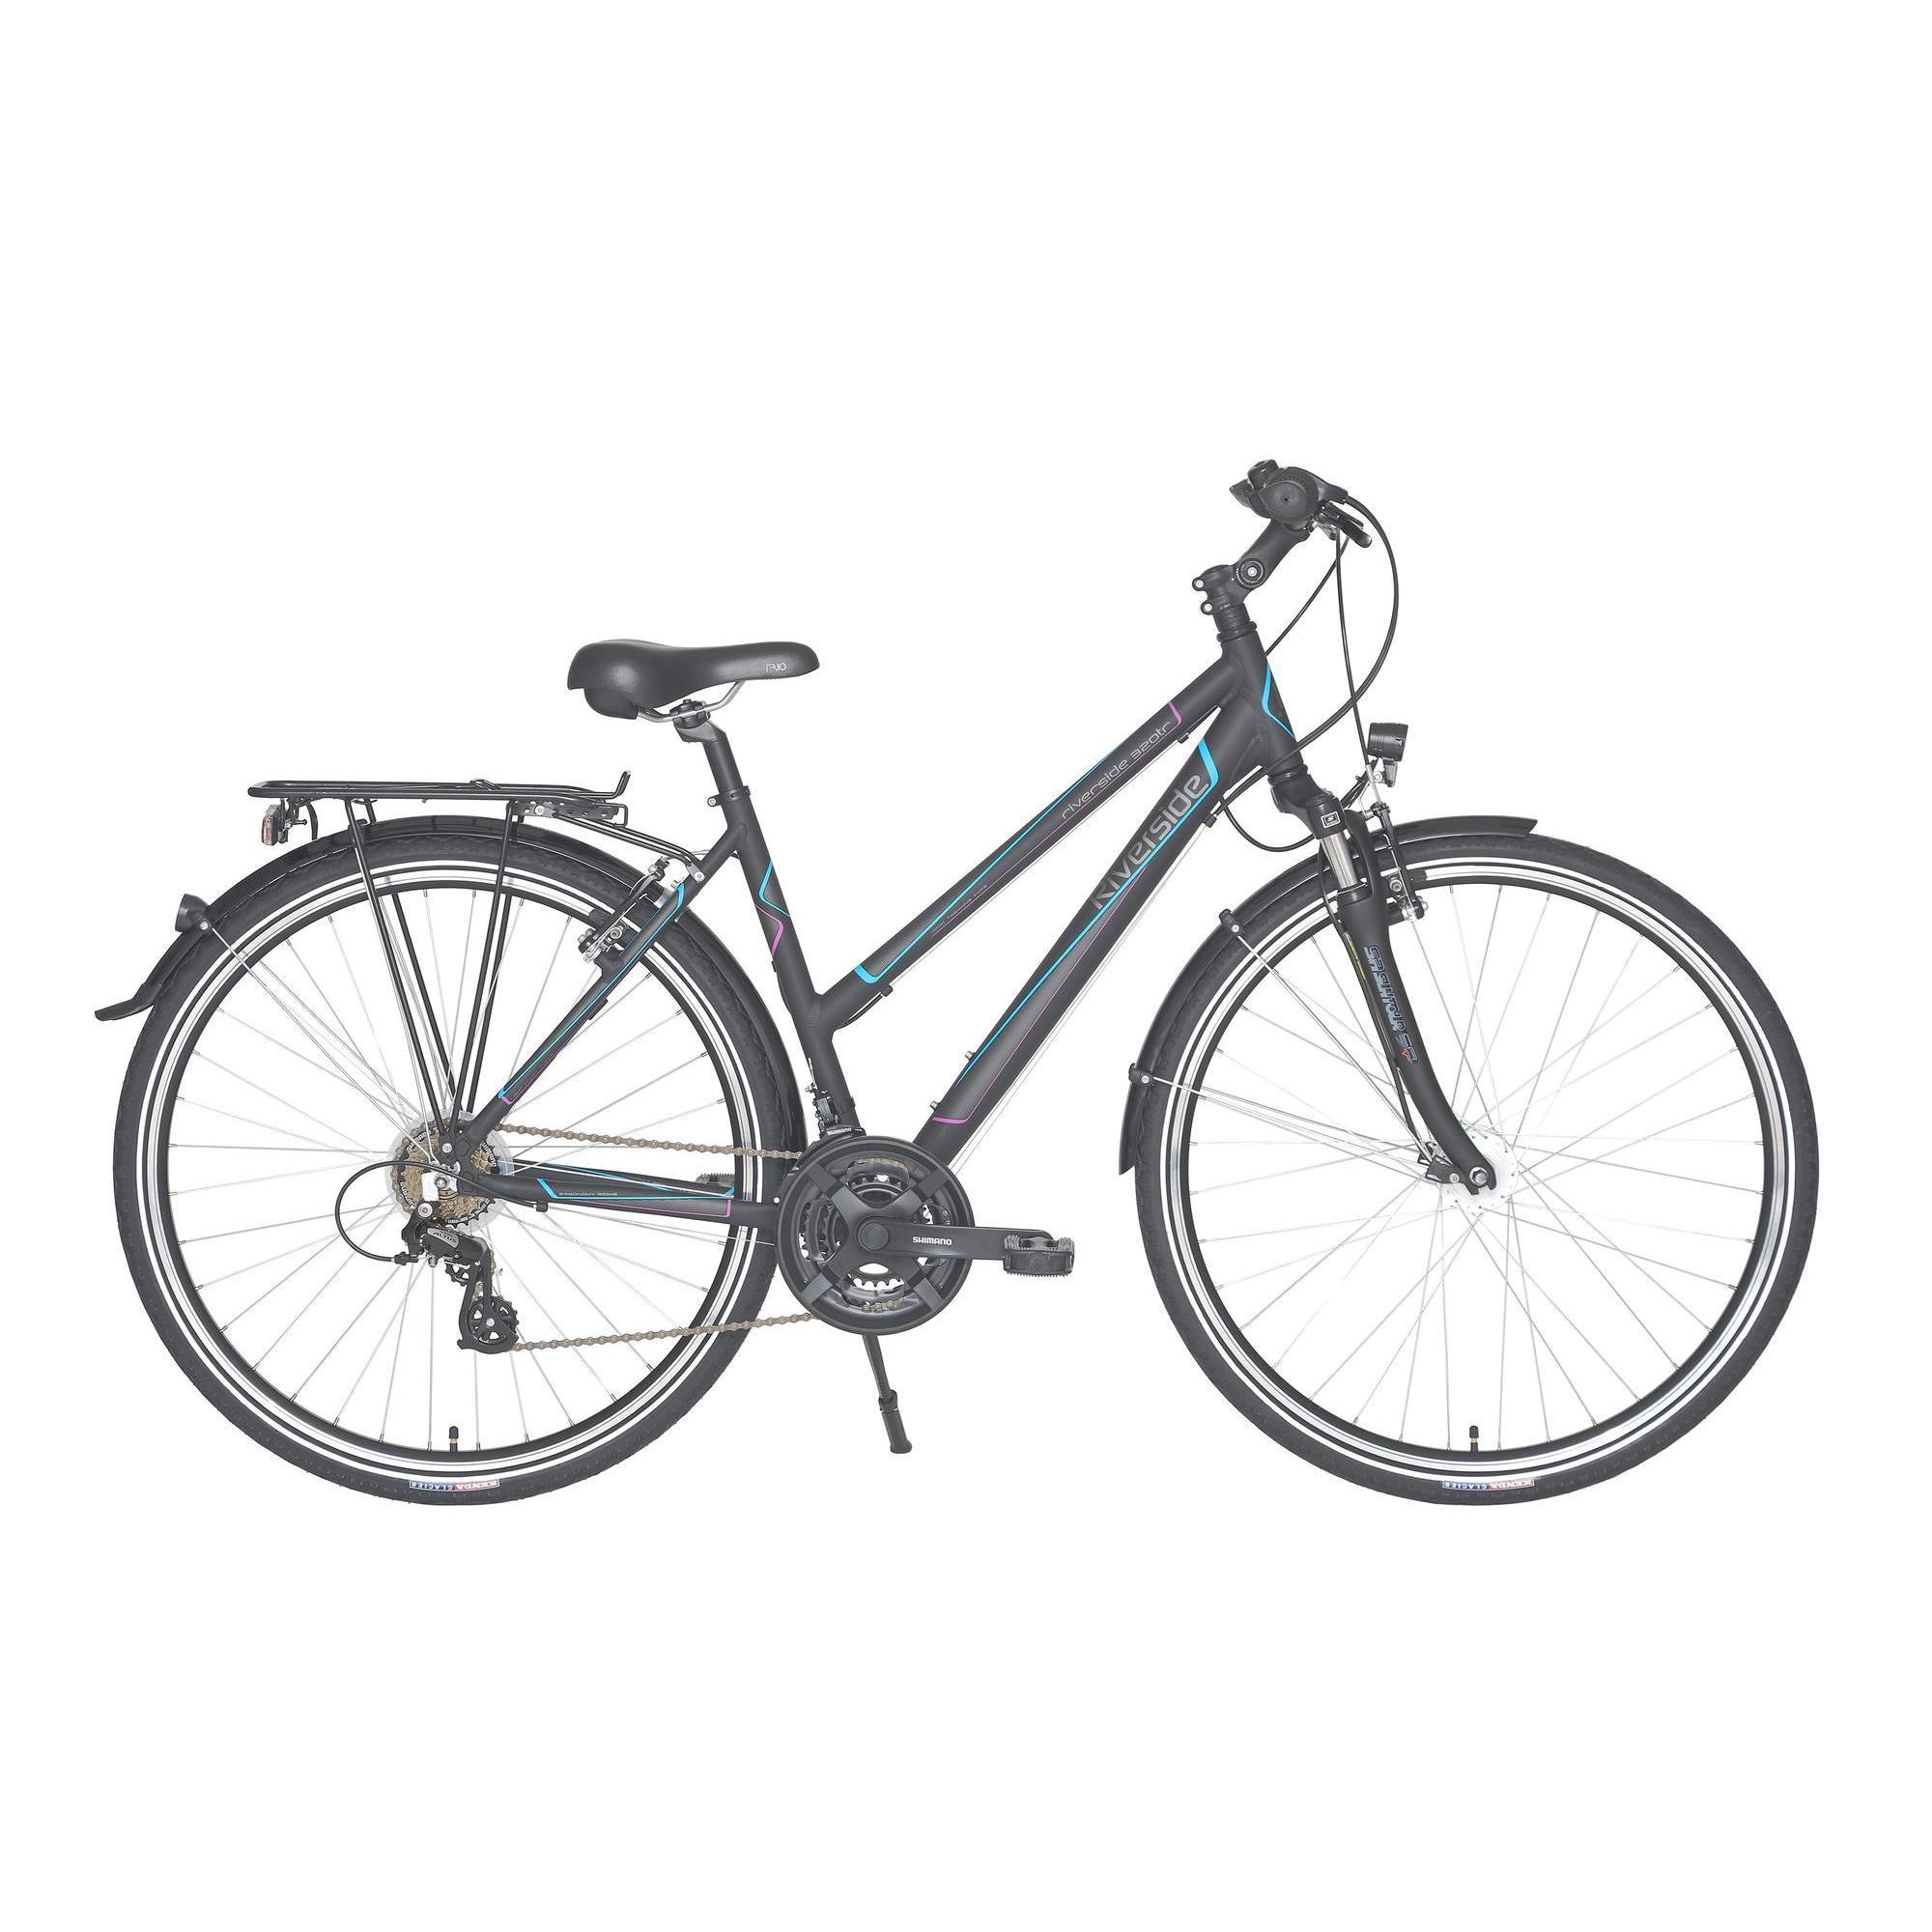 damen tourenrad 28 zoll cheap ktm damen fahrrad zoll blau. Black Bedroom Furniture Sets. Home Design Ideas